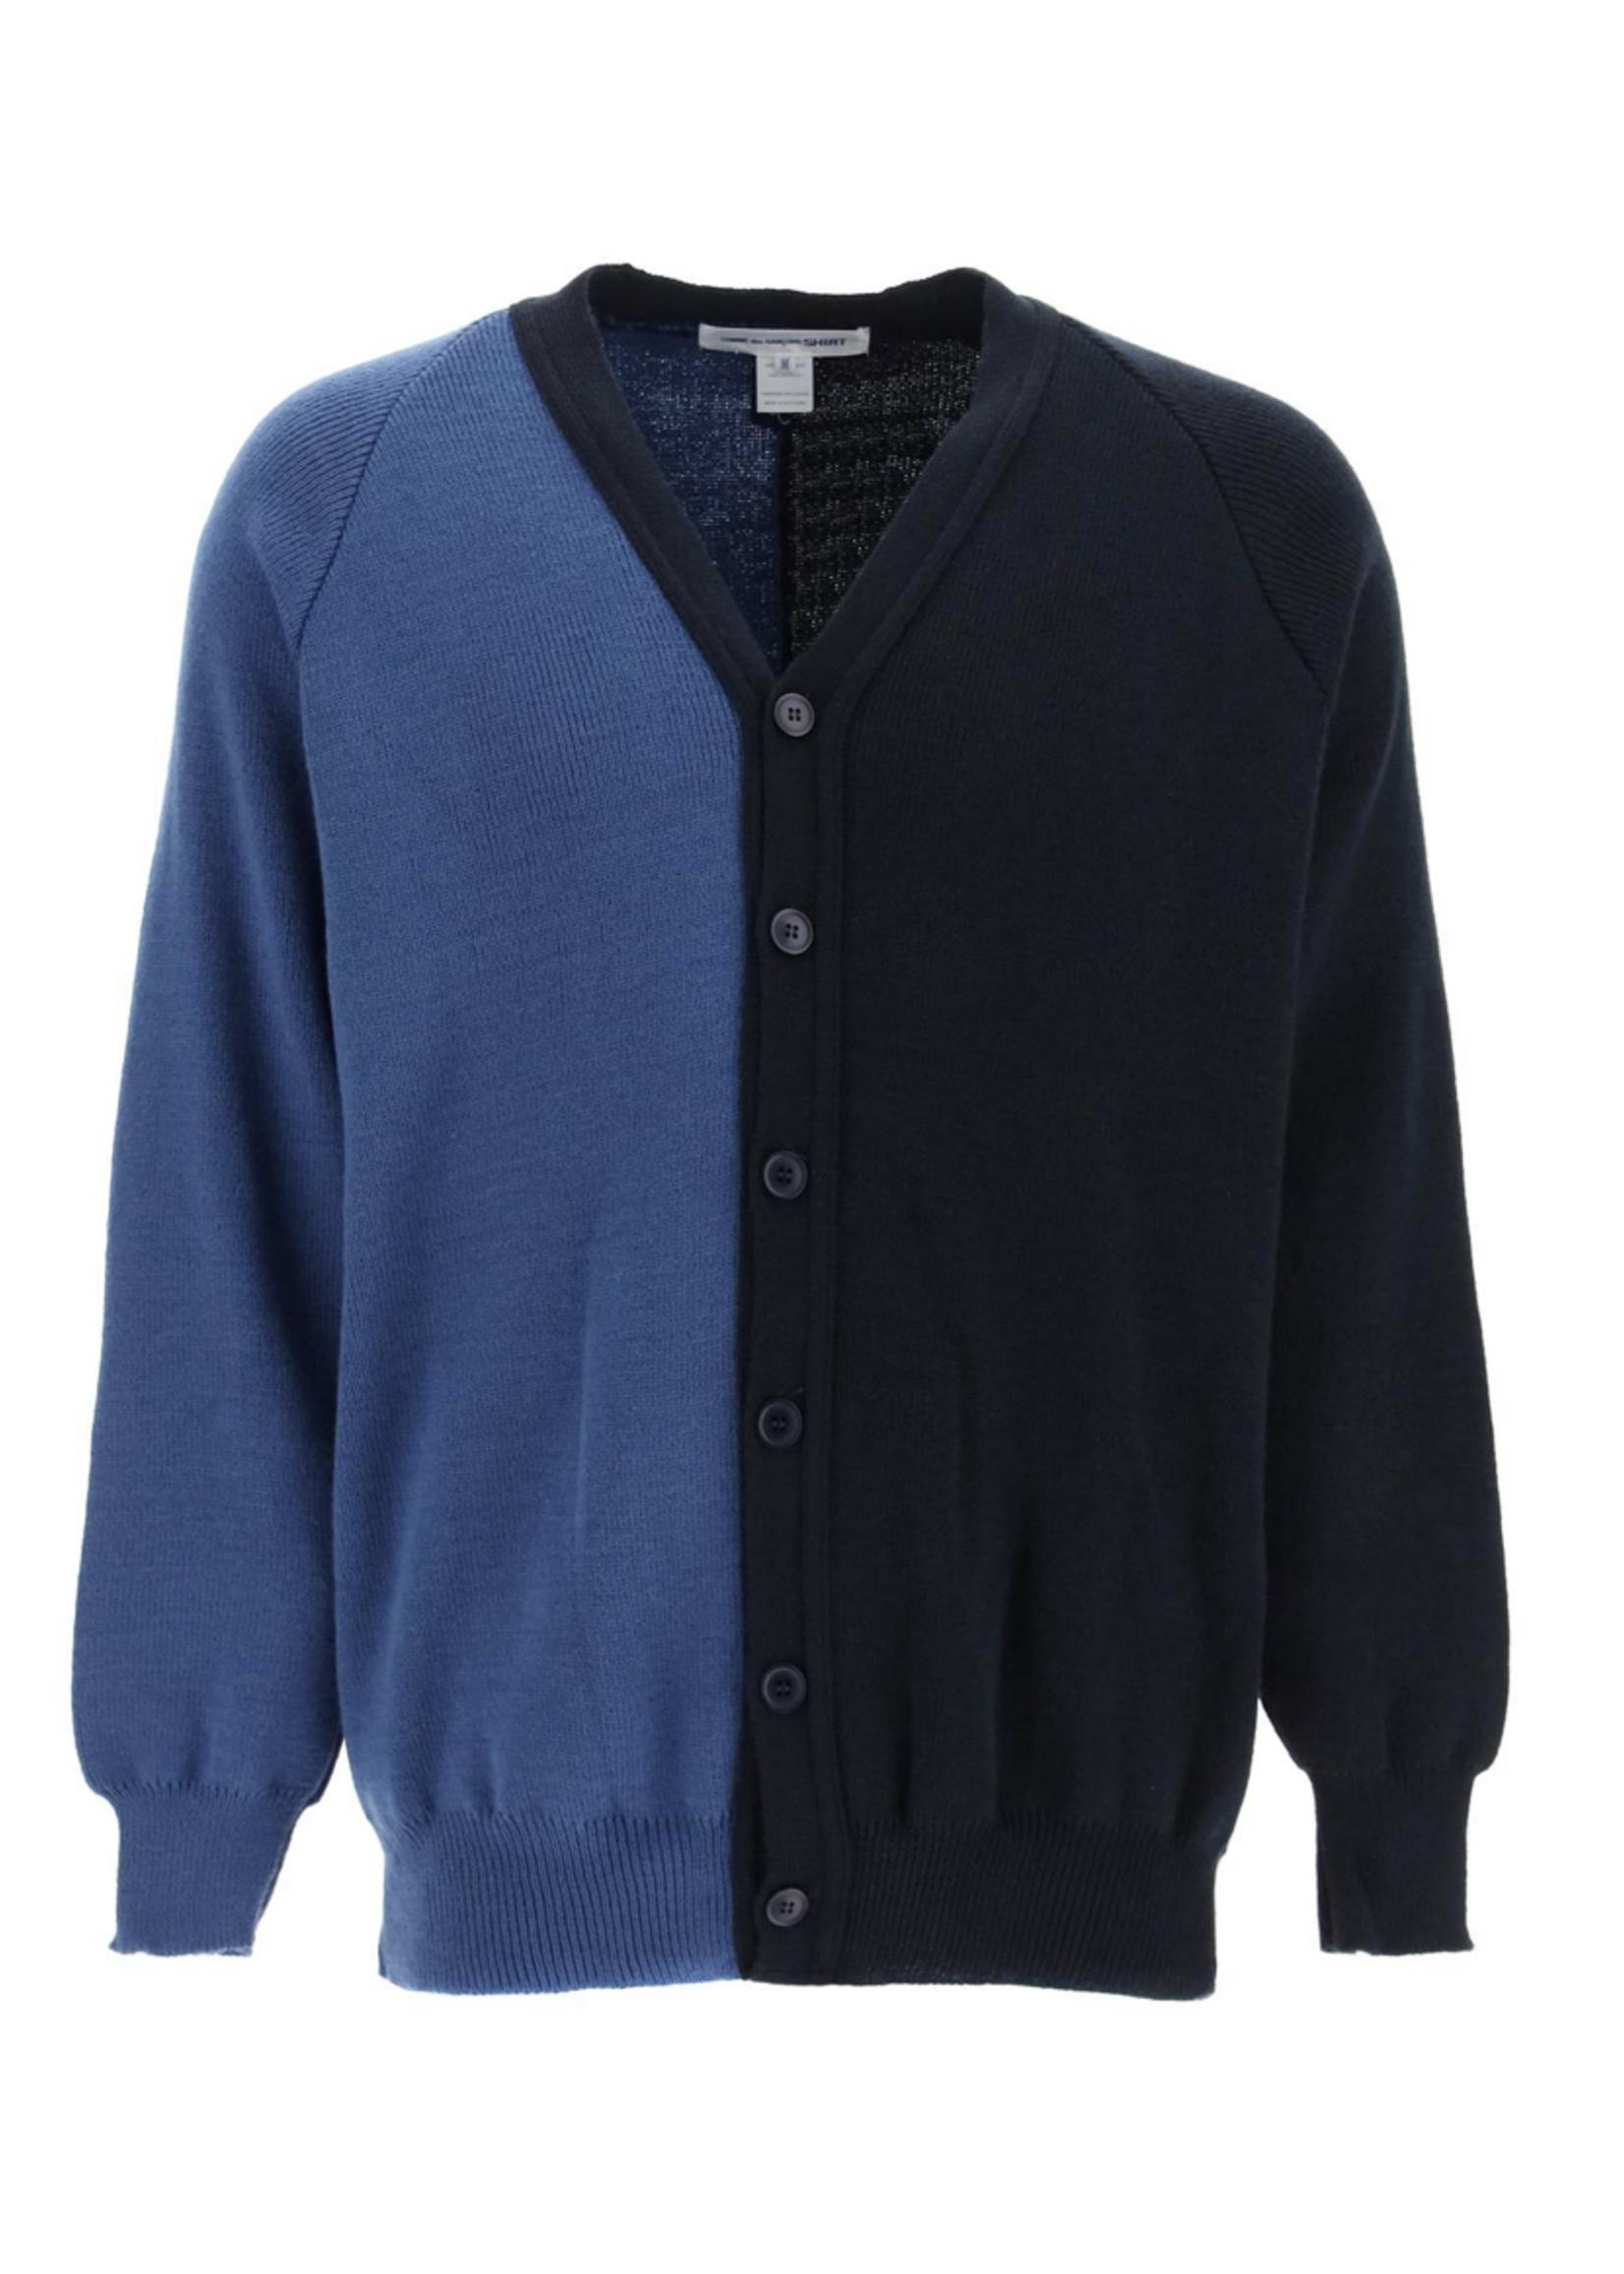 COMME des GARÇONS SHIRT Color Block Cardigan Sweater in Blue